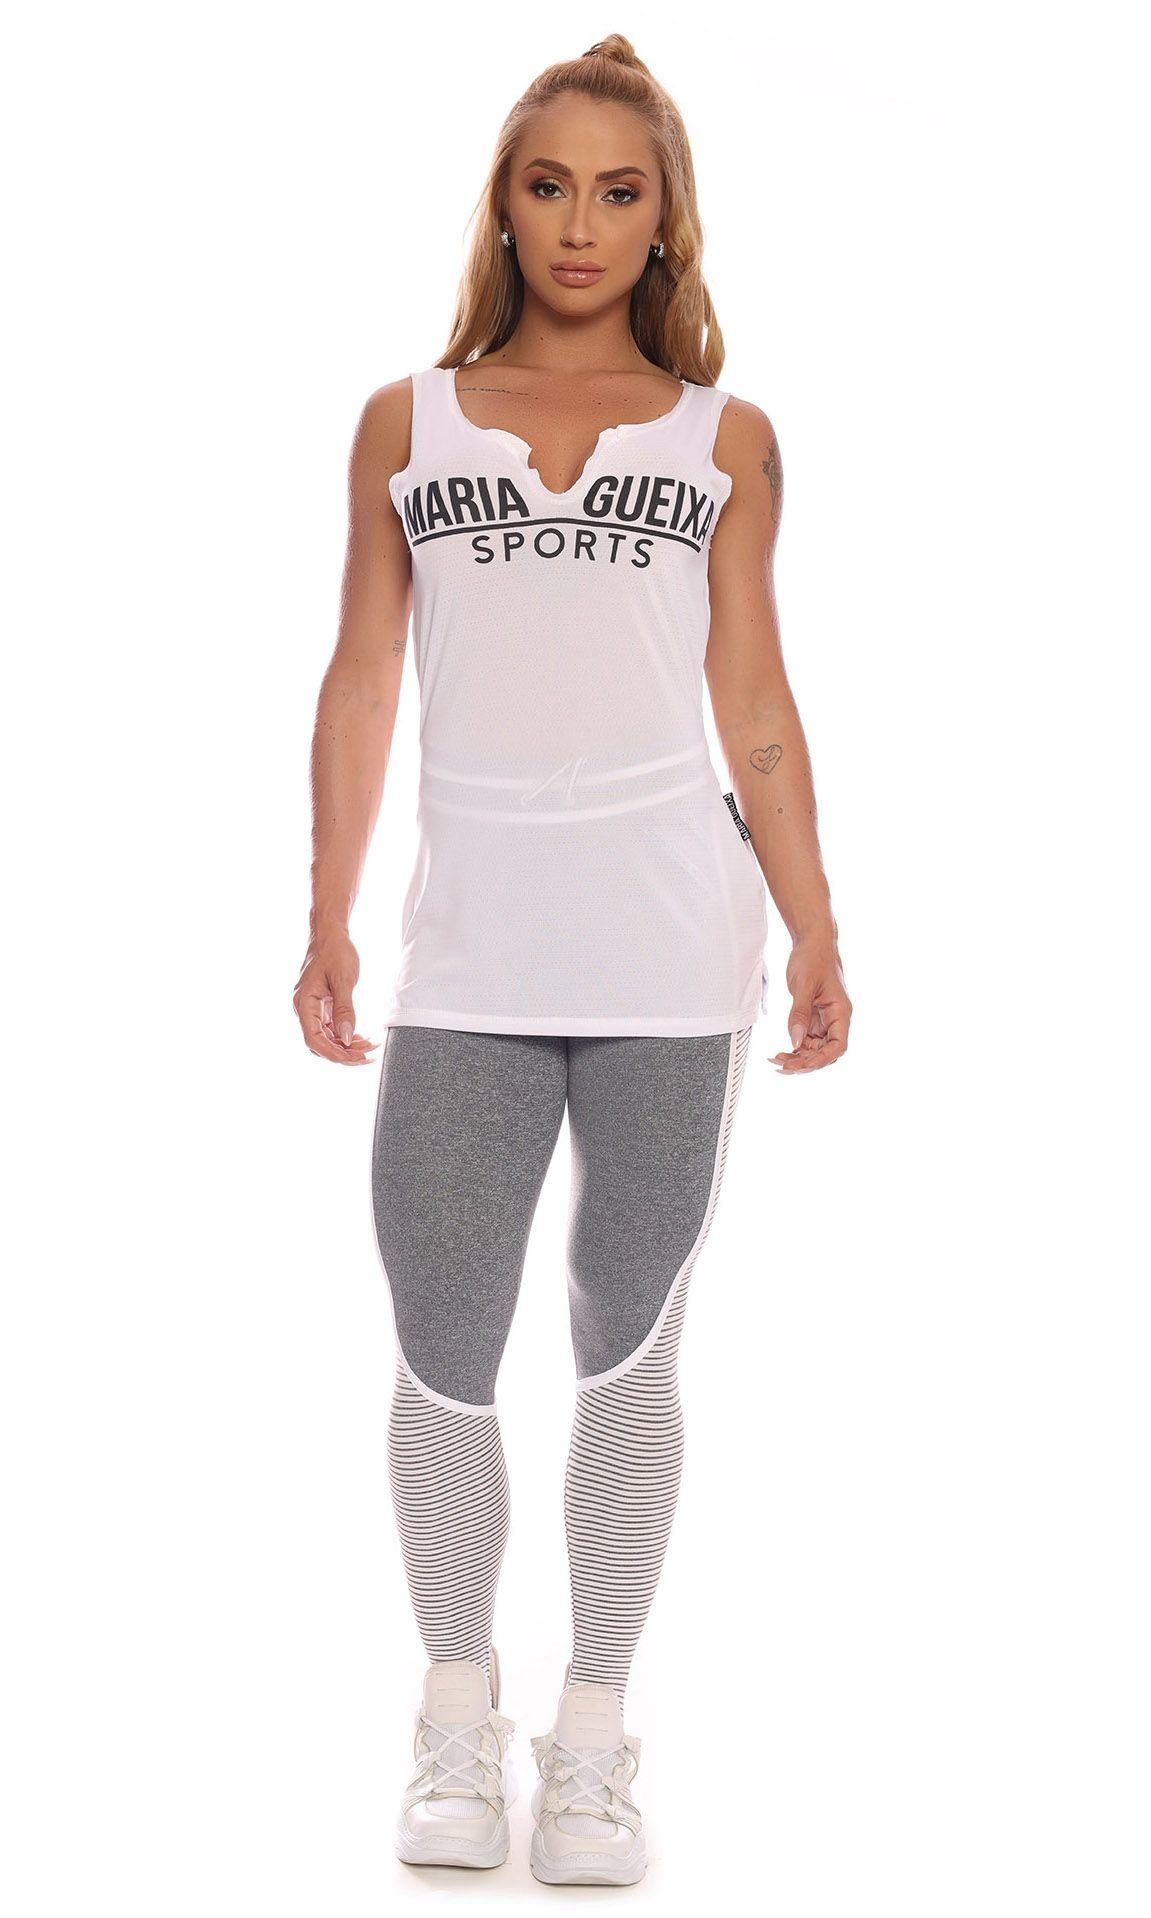 Blusa Long Shirt Sports Dry Maria Gueixa Branco